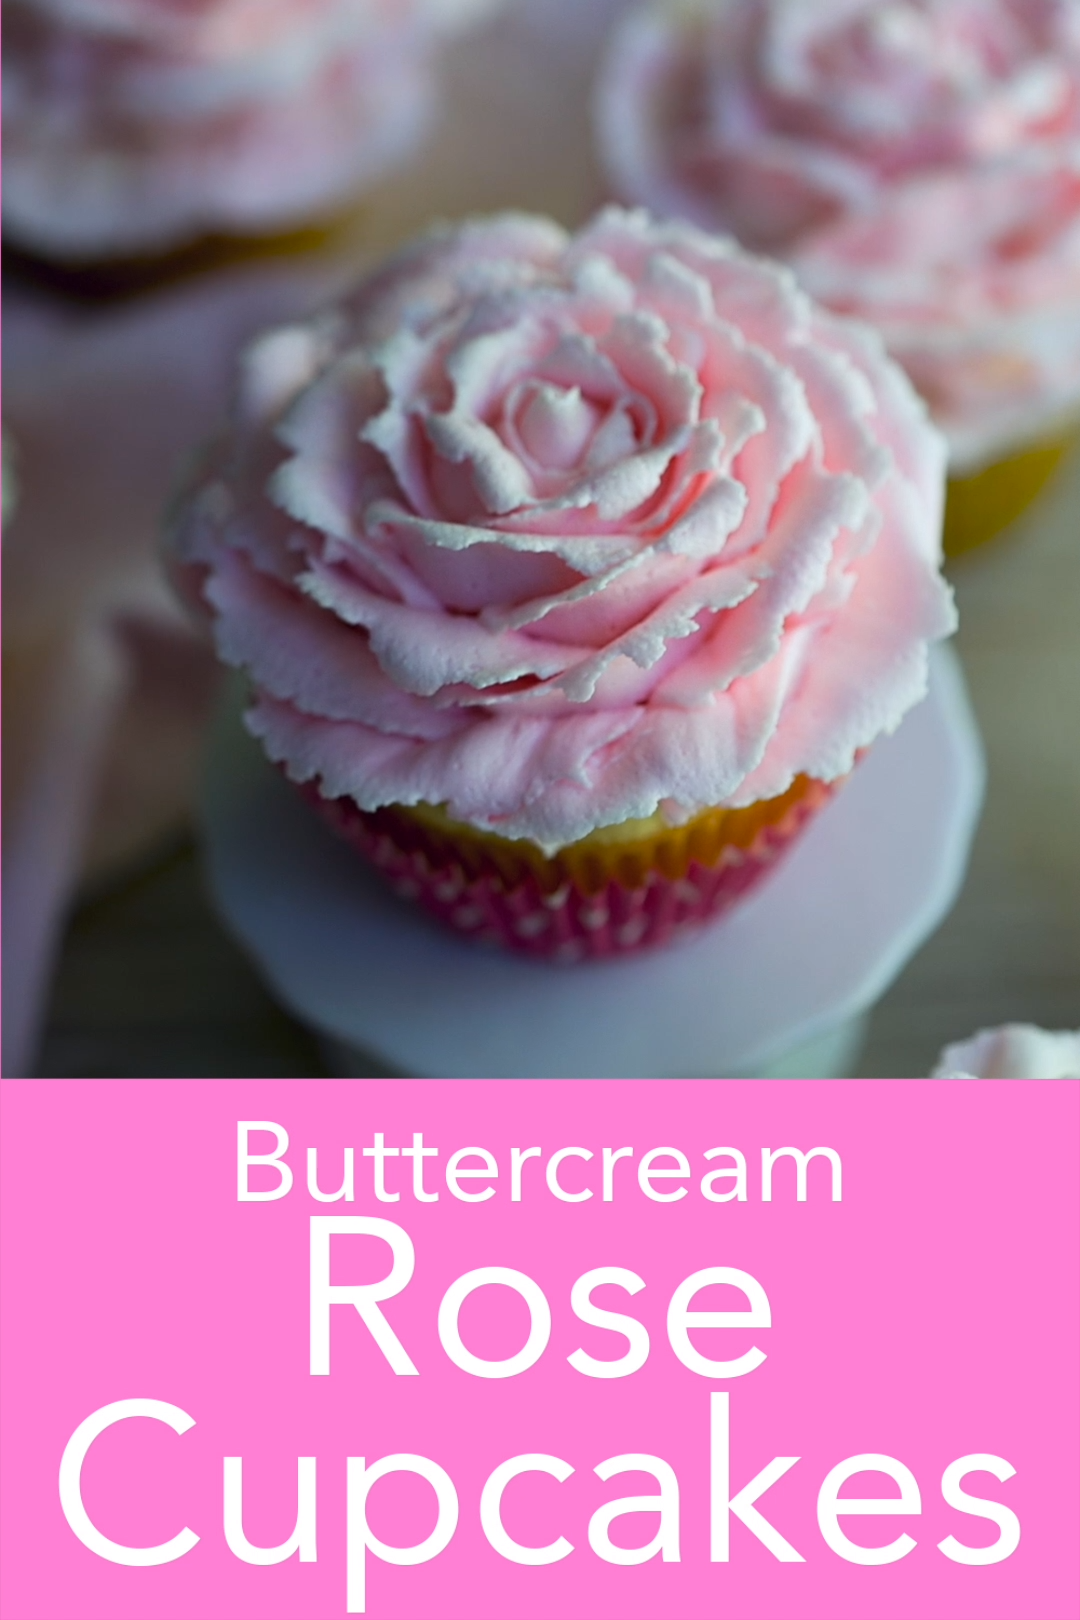 Photo of Buttercream Rose Cupcakes